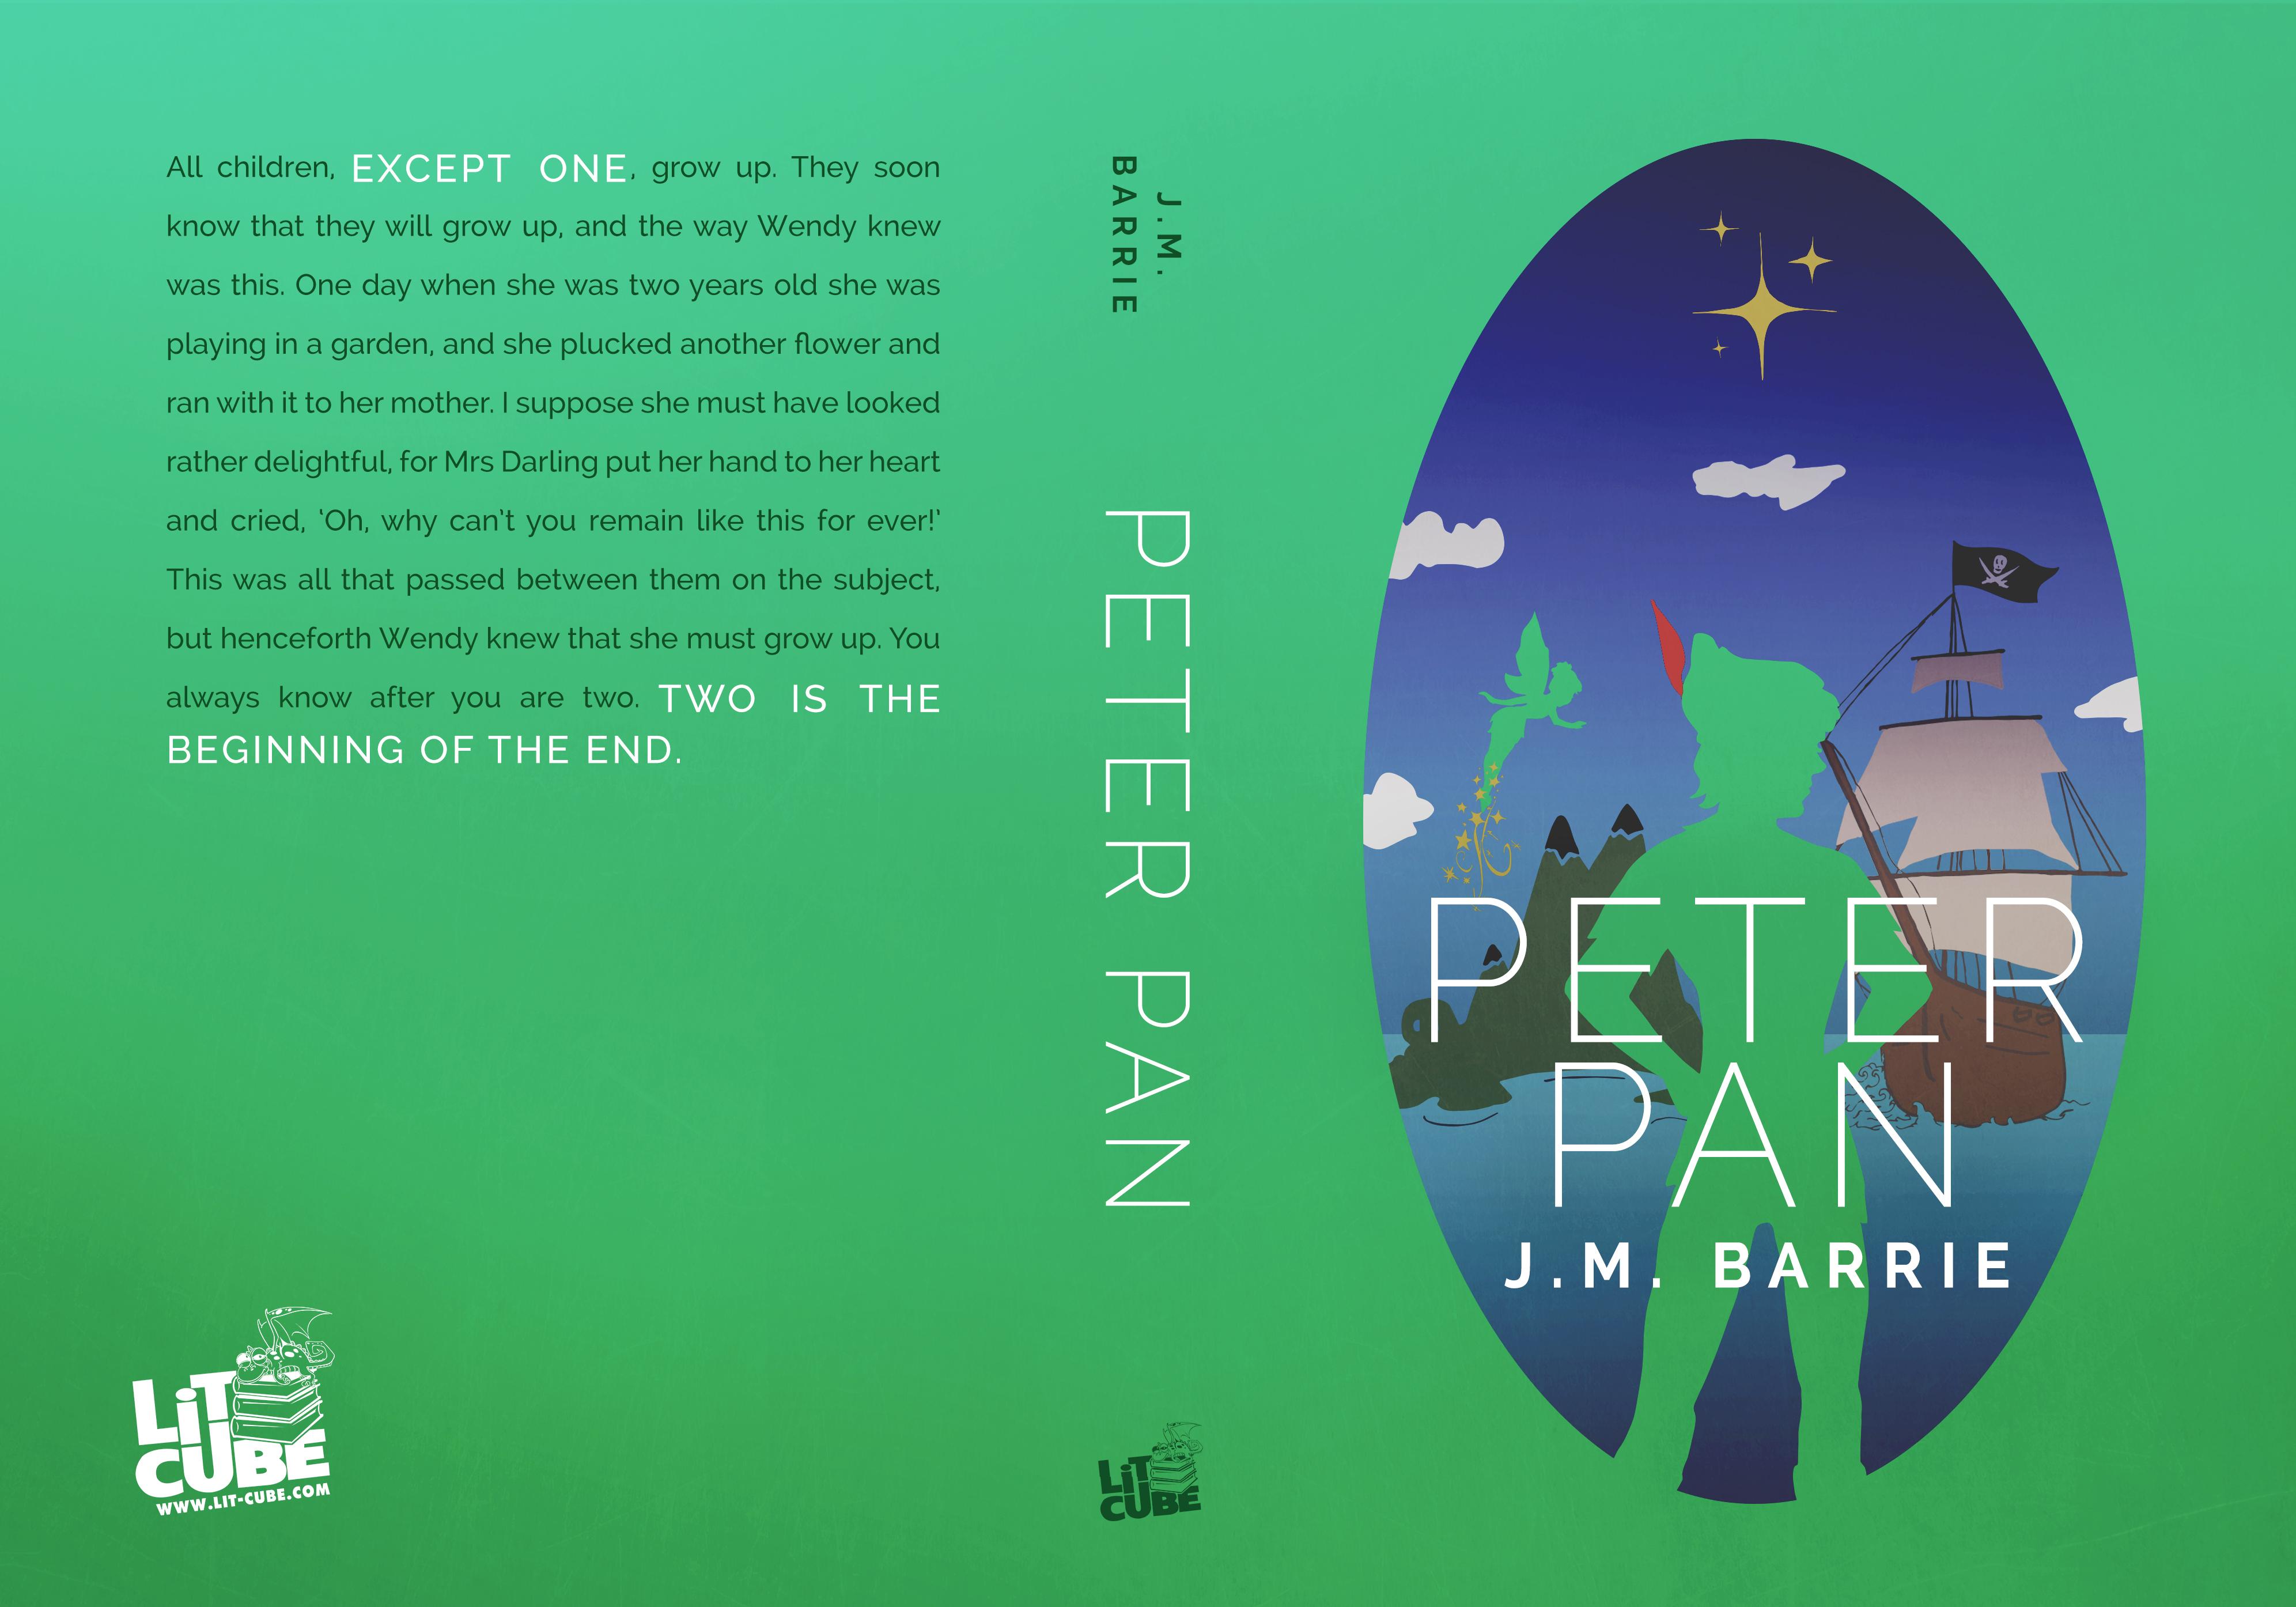 PeterPan.6x9.v2